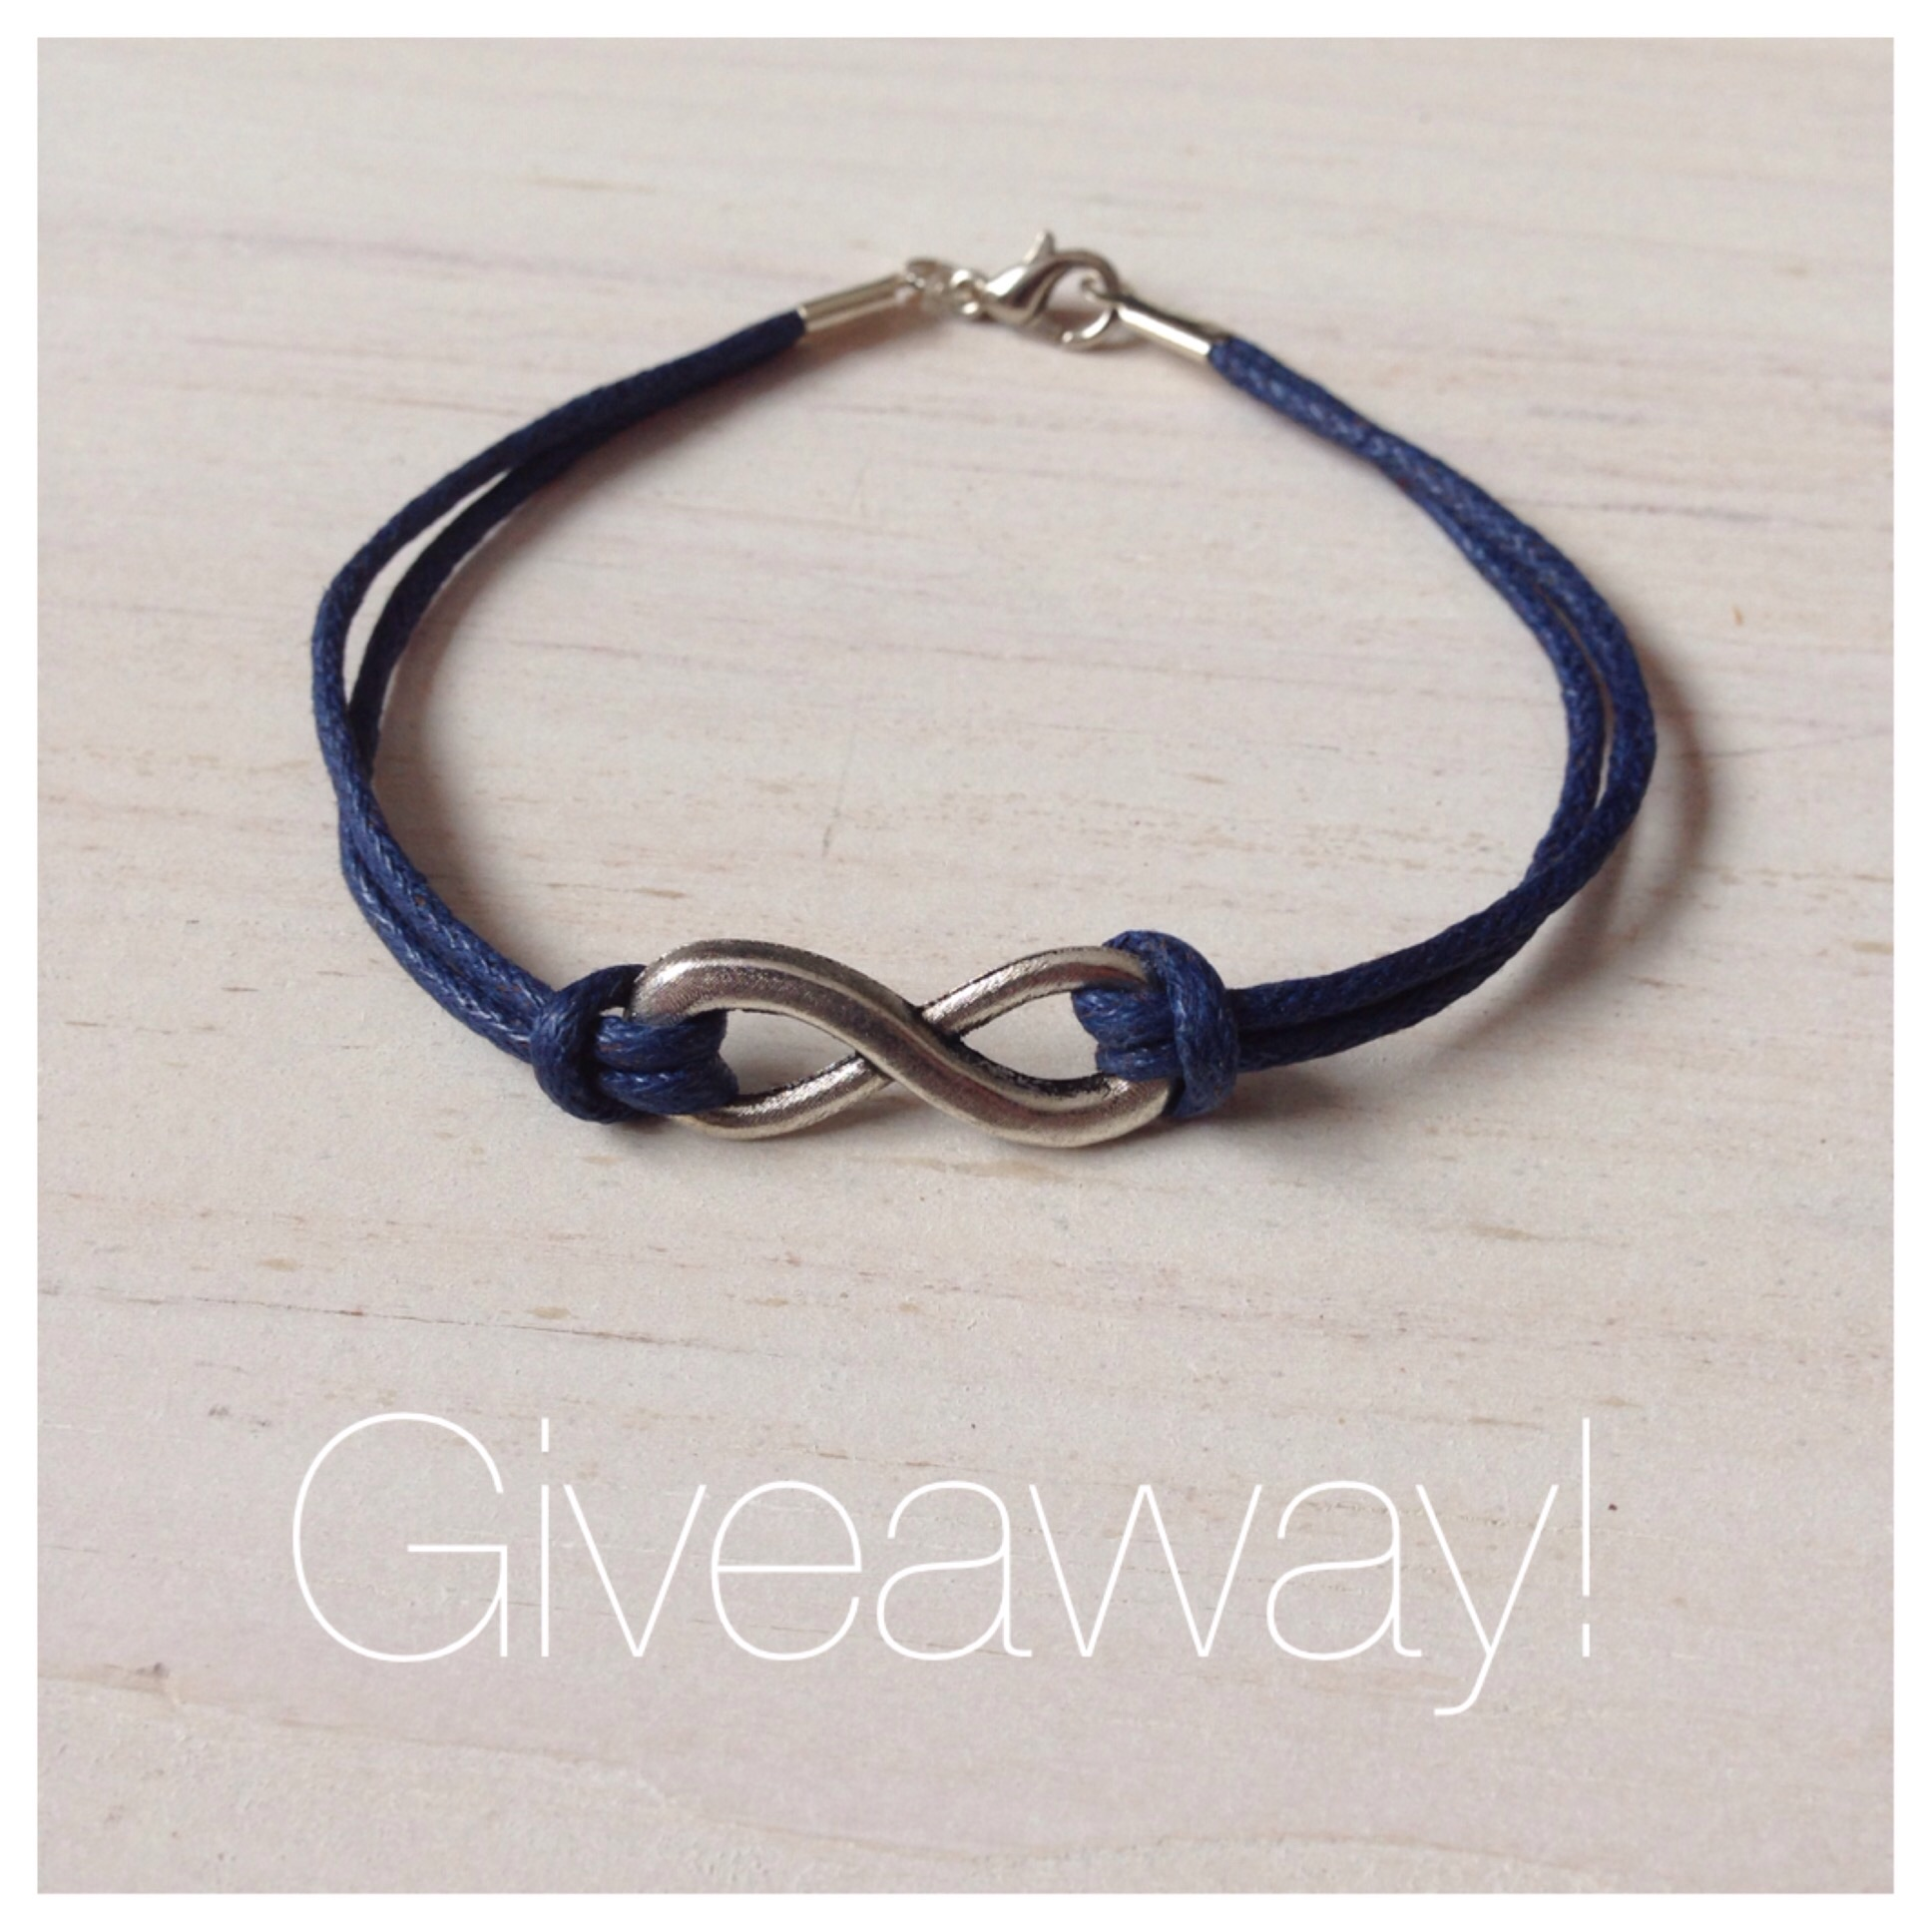 Infinity Bracelet Giveaway from Birch Landing Home on Instagram